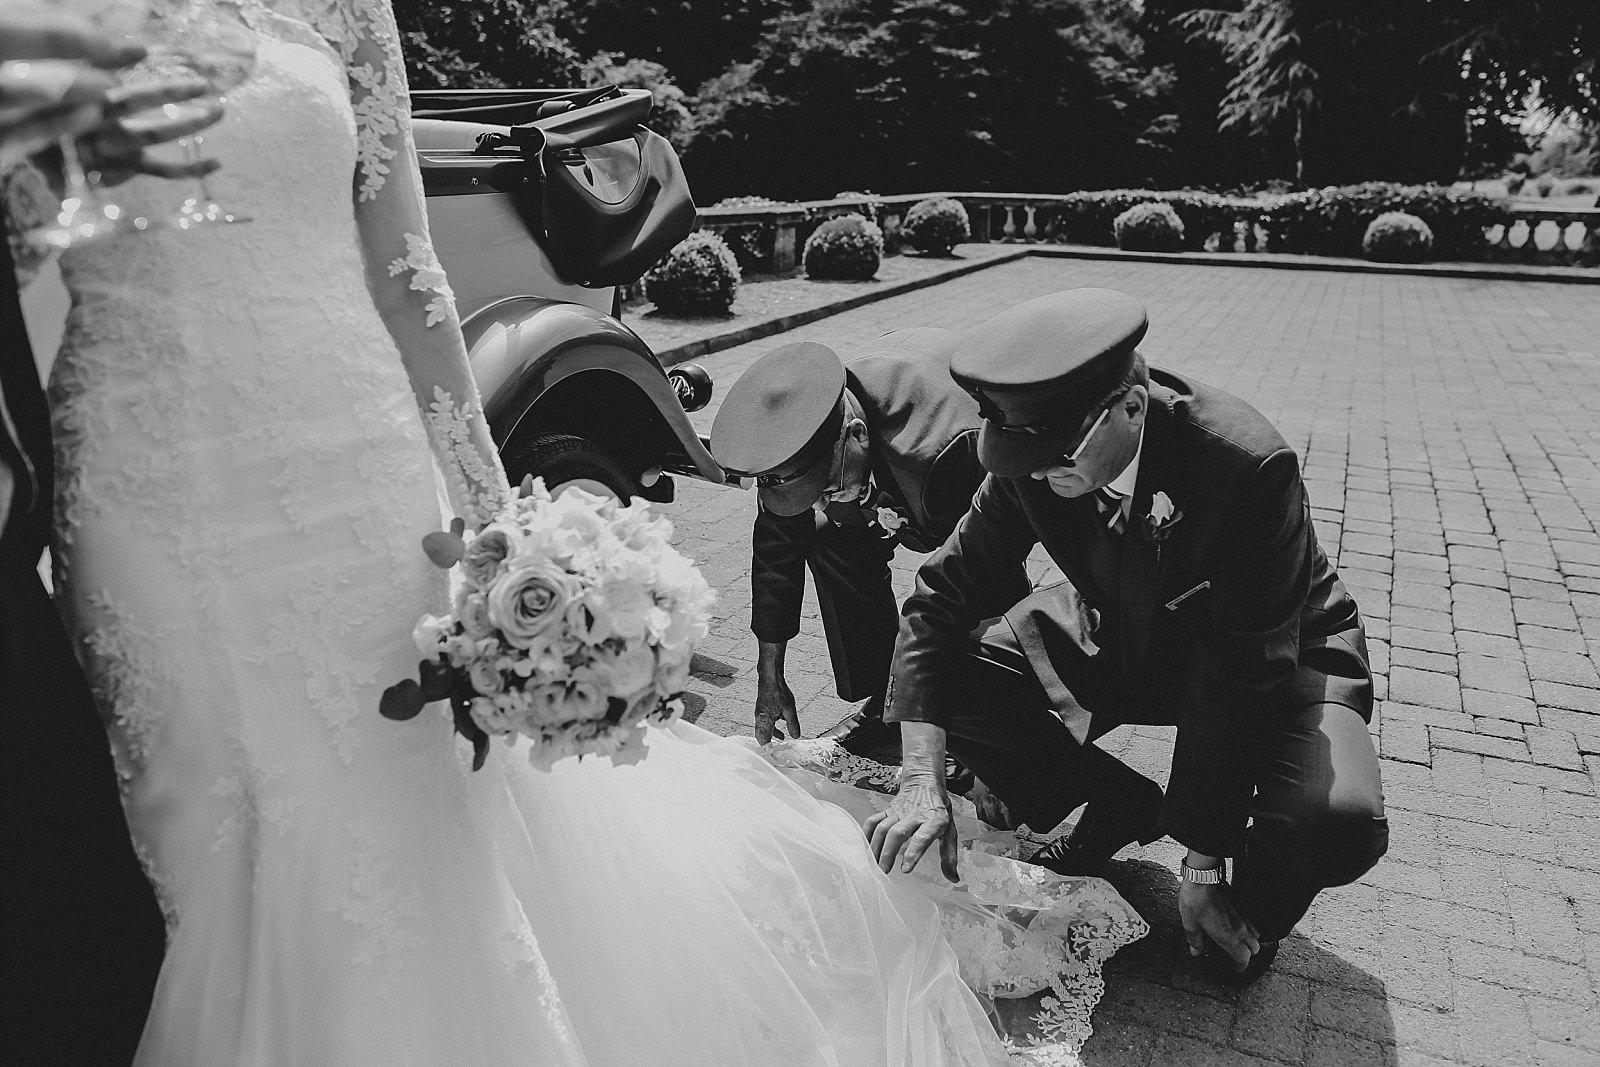 top class service from malvern wedding cars